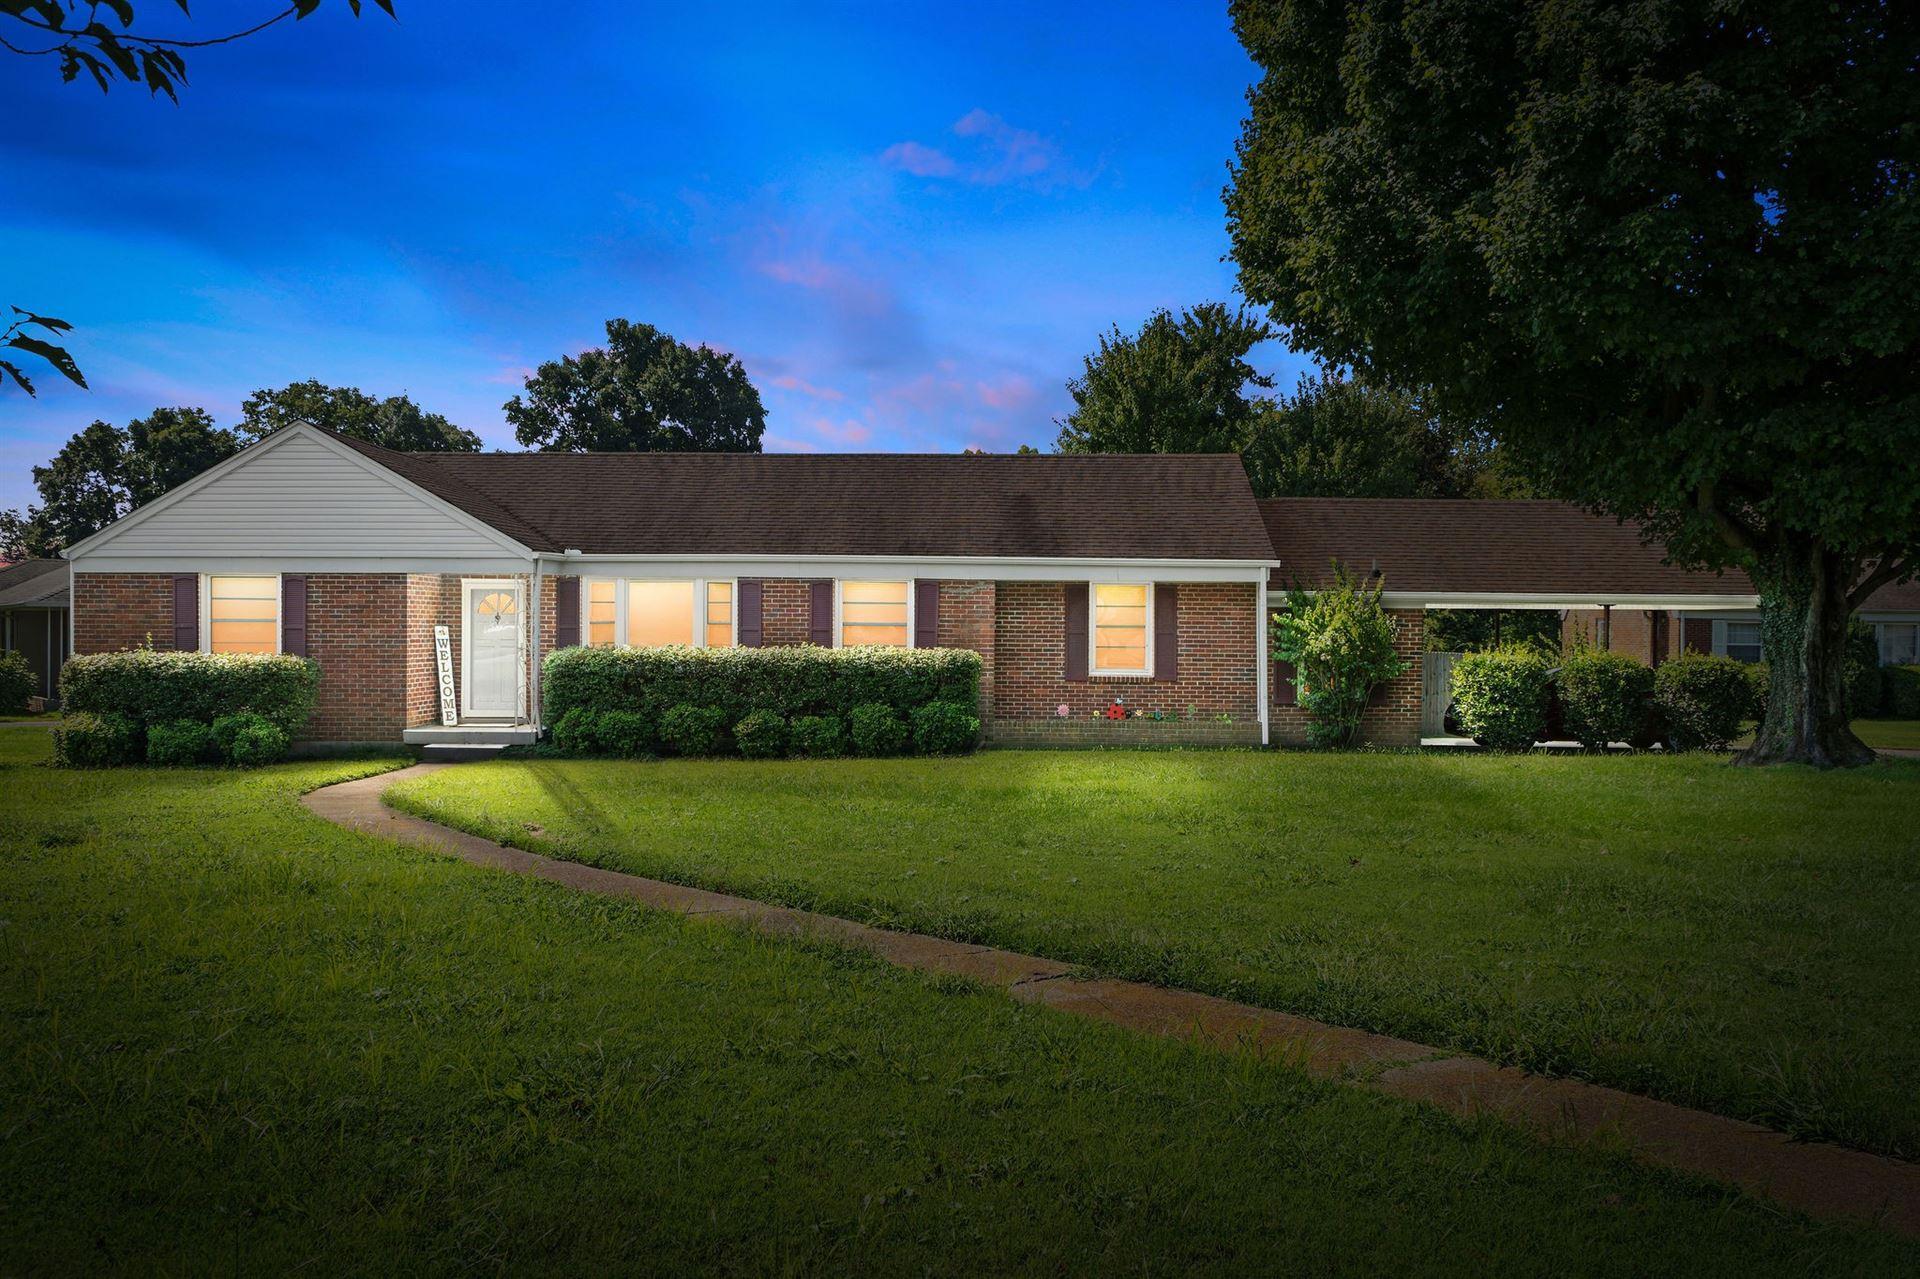 104 Allenwood Dr, Clarksville, TN 37043 - MLS#: 2291184